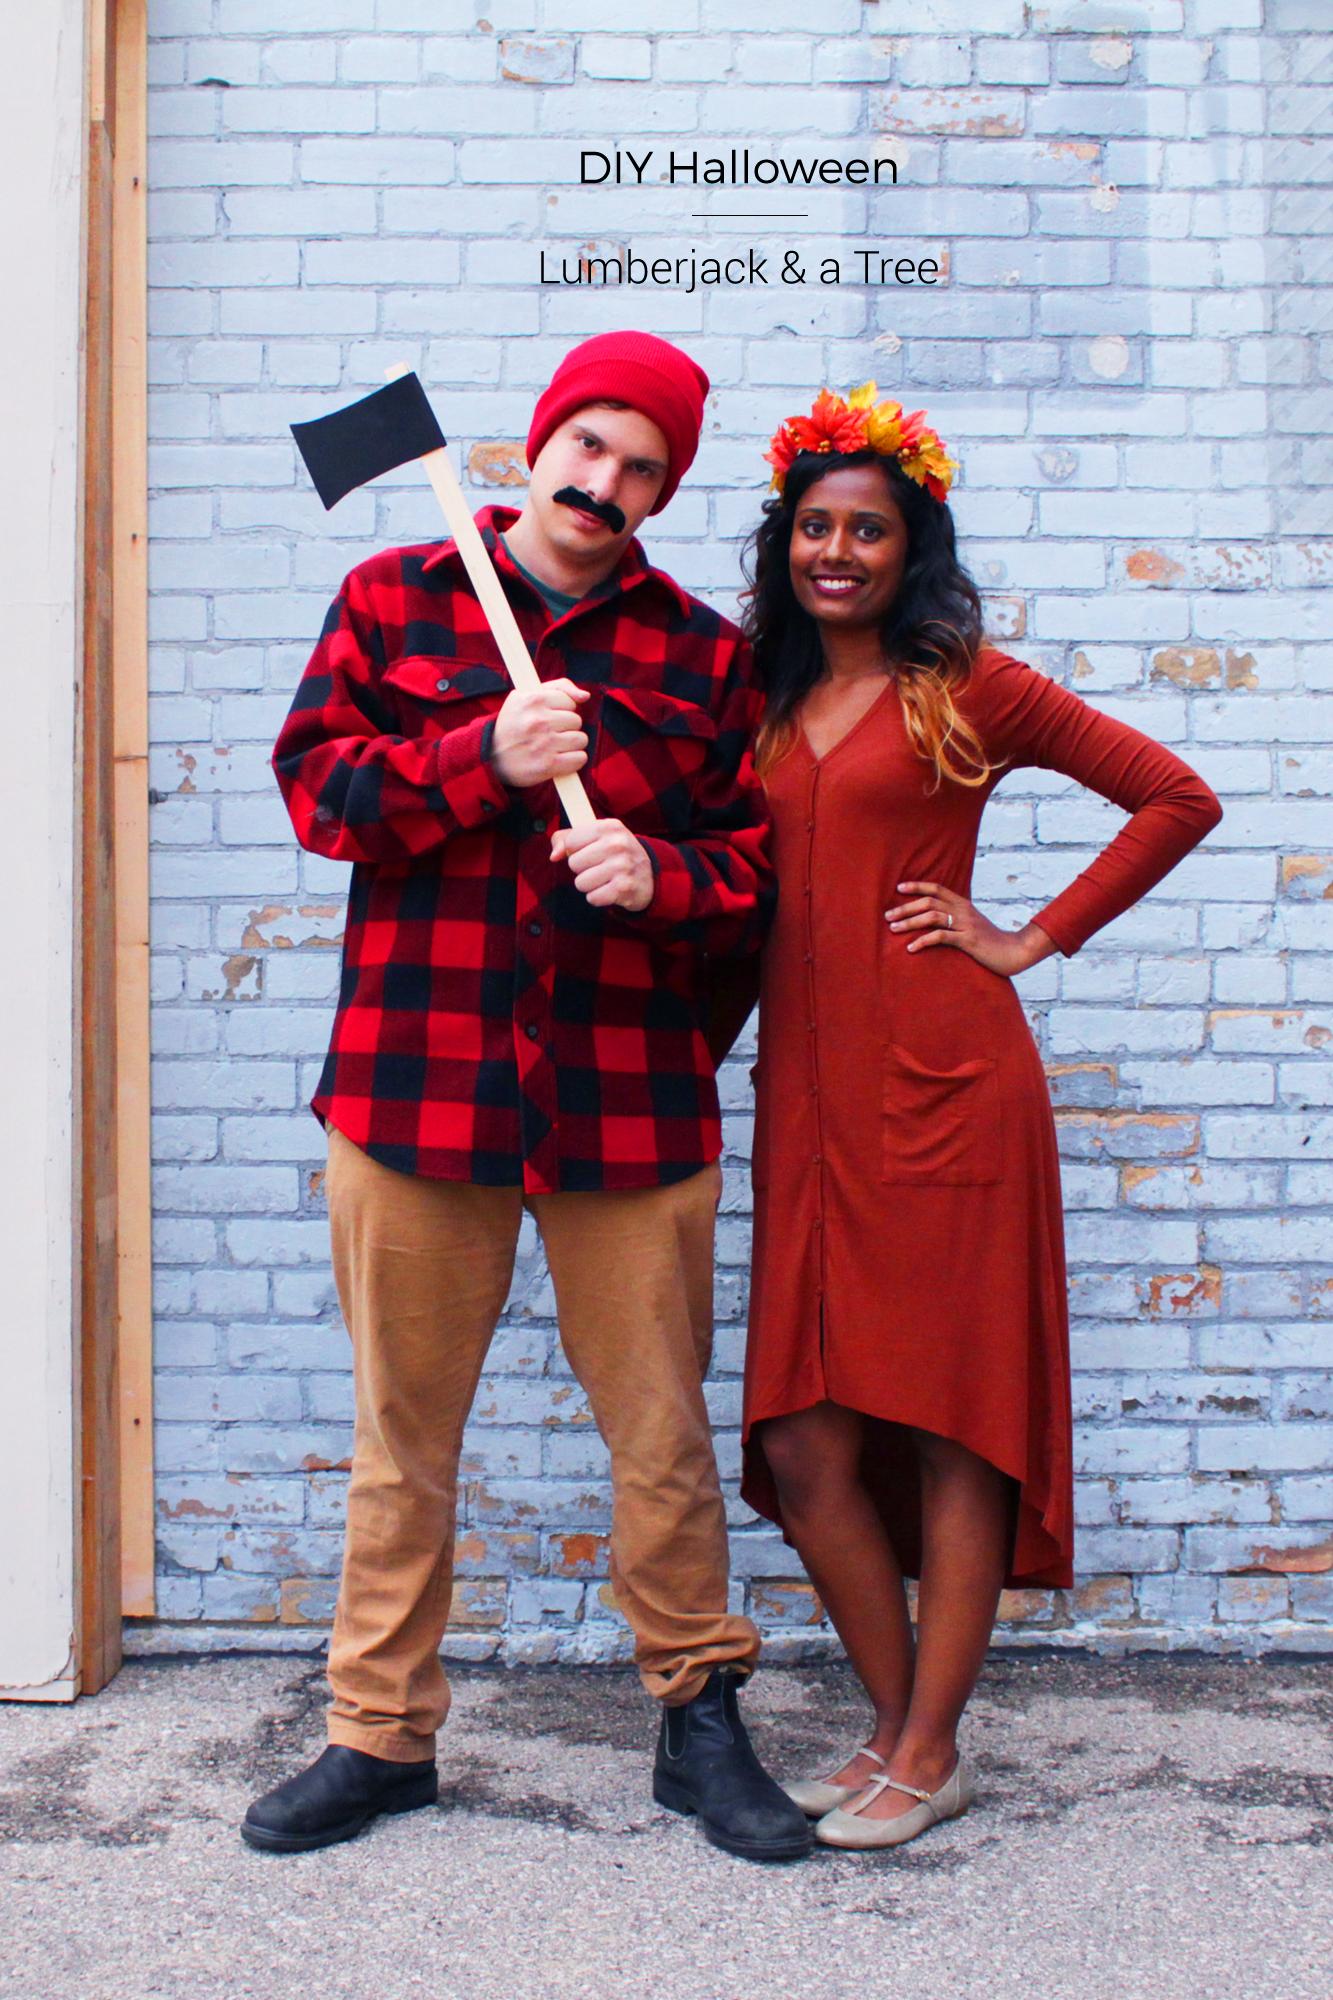 DIY Halloween Couples Costume Couple halloween costumes